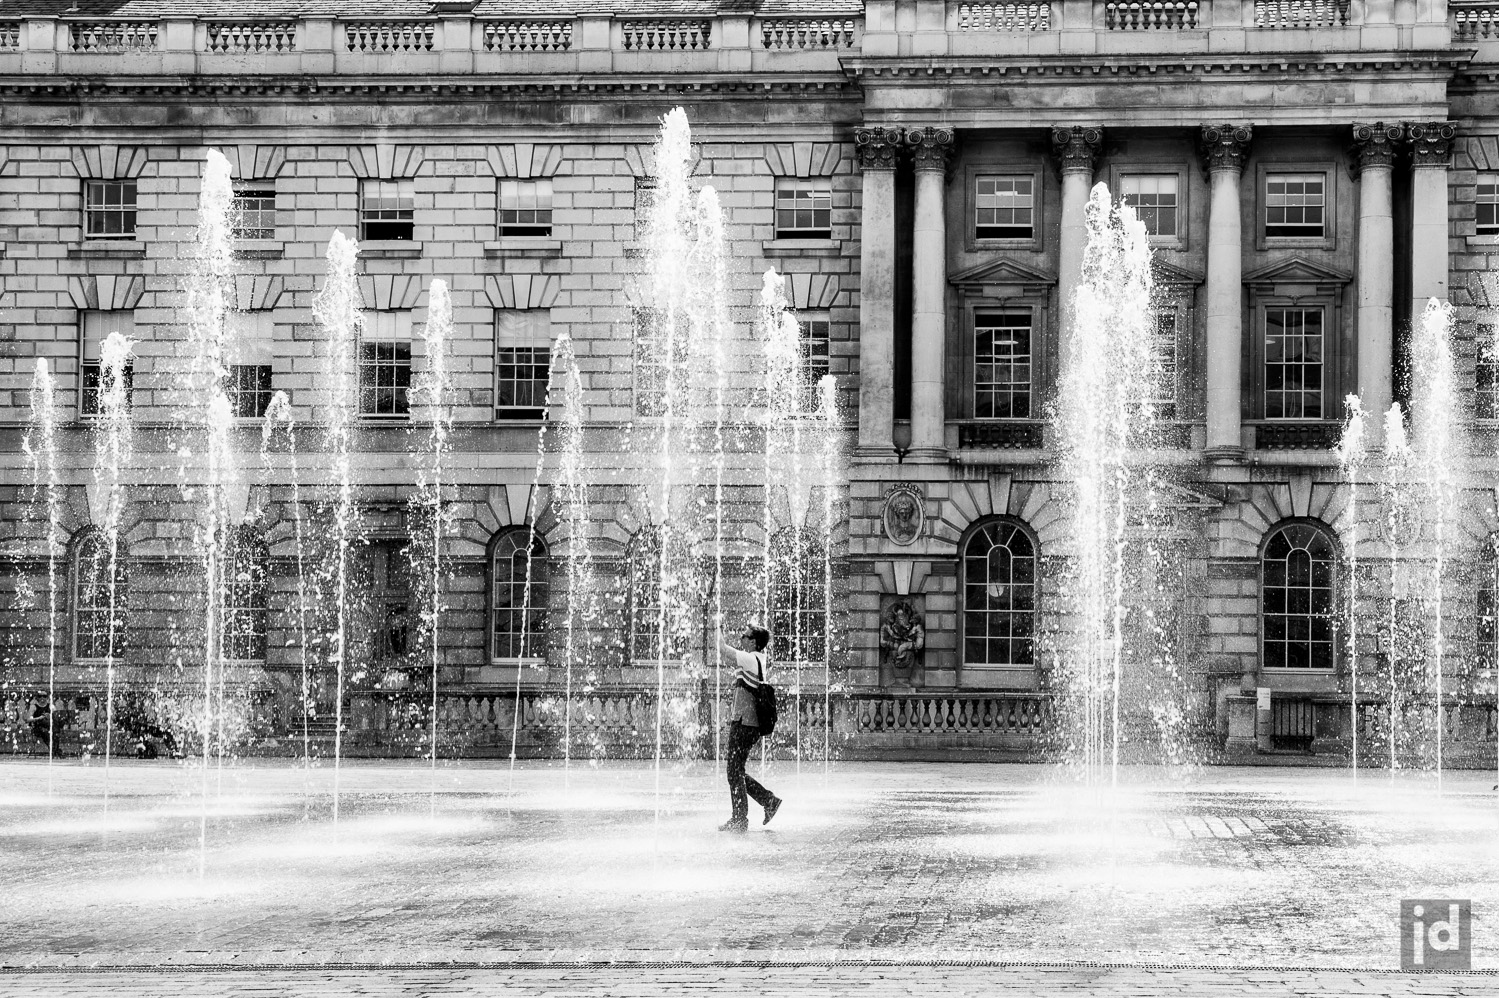 London_Photography_Jason_Davis_Images_001-4.jpg